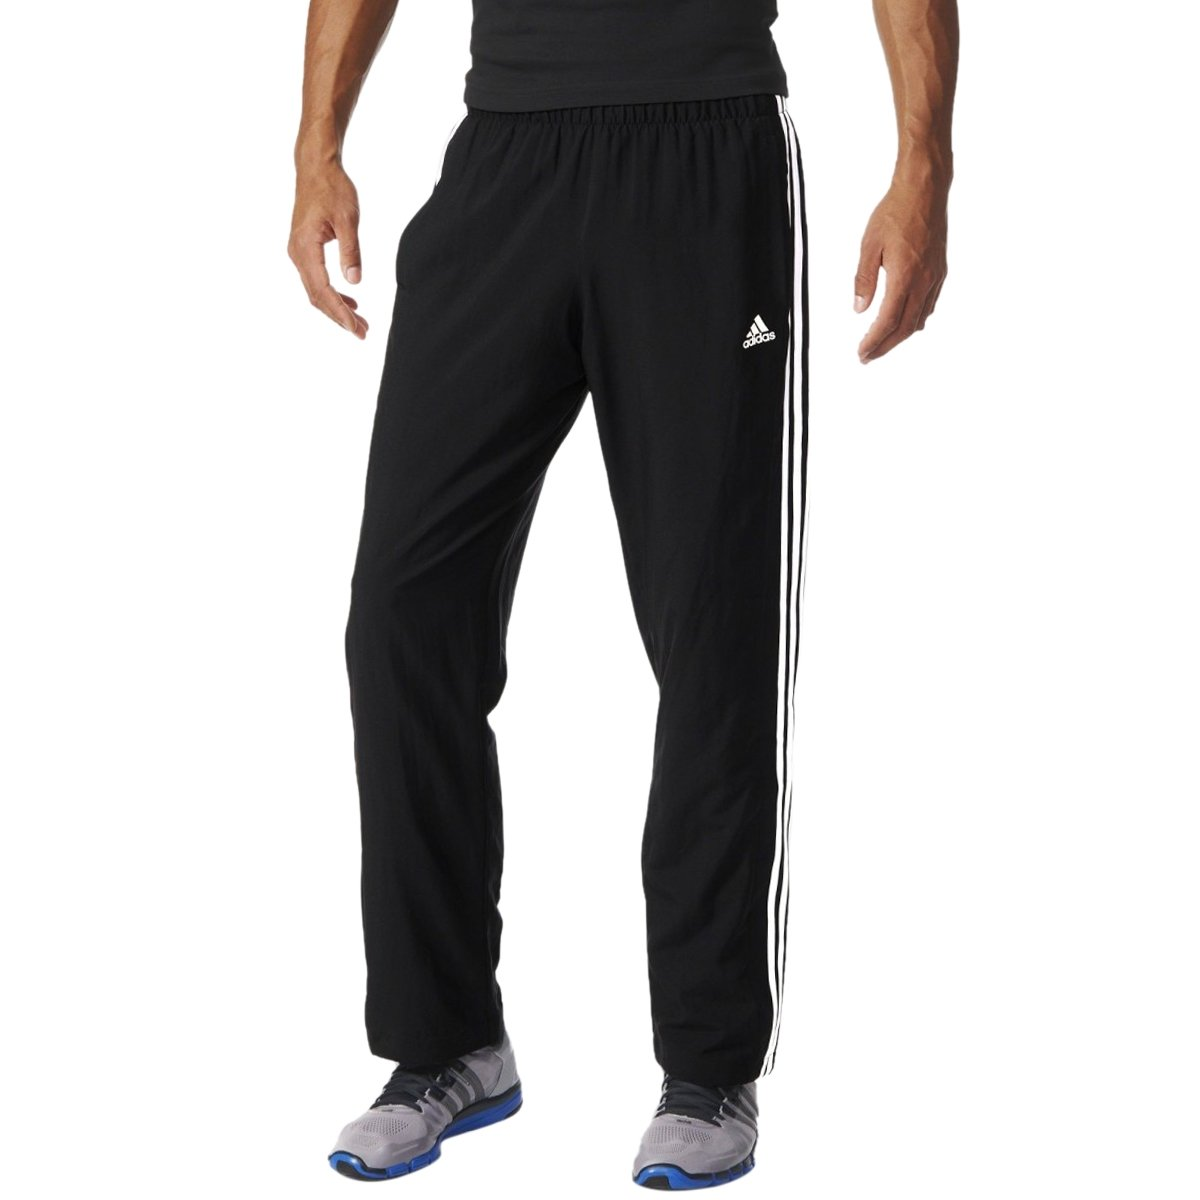 Bizz Store - Calça Masculina Adidas Woven ESS 3s Preto Esportiva 04b5bf3924752